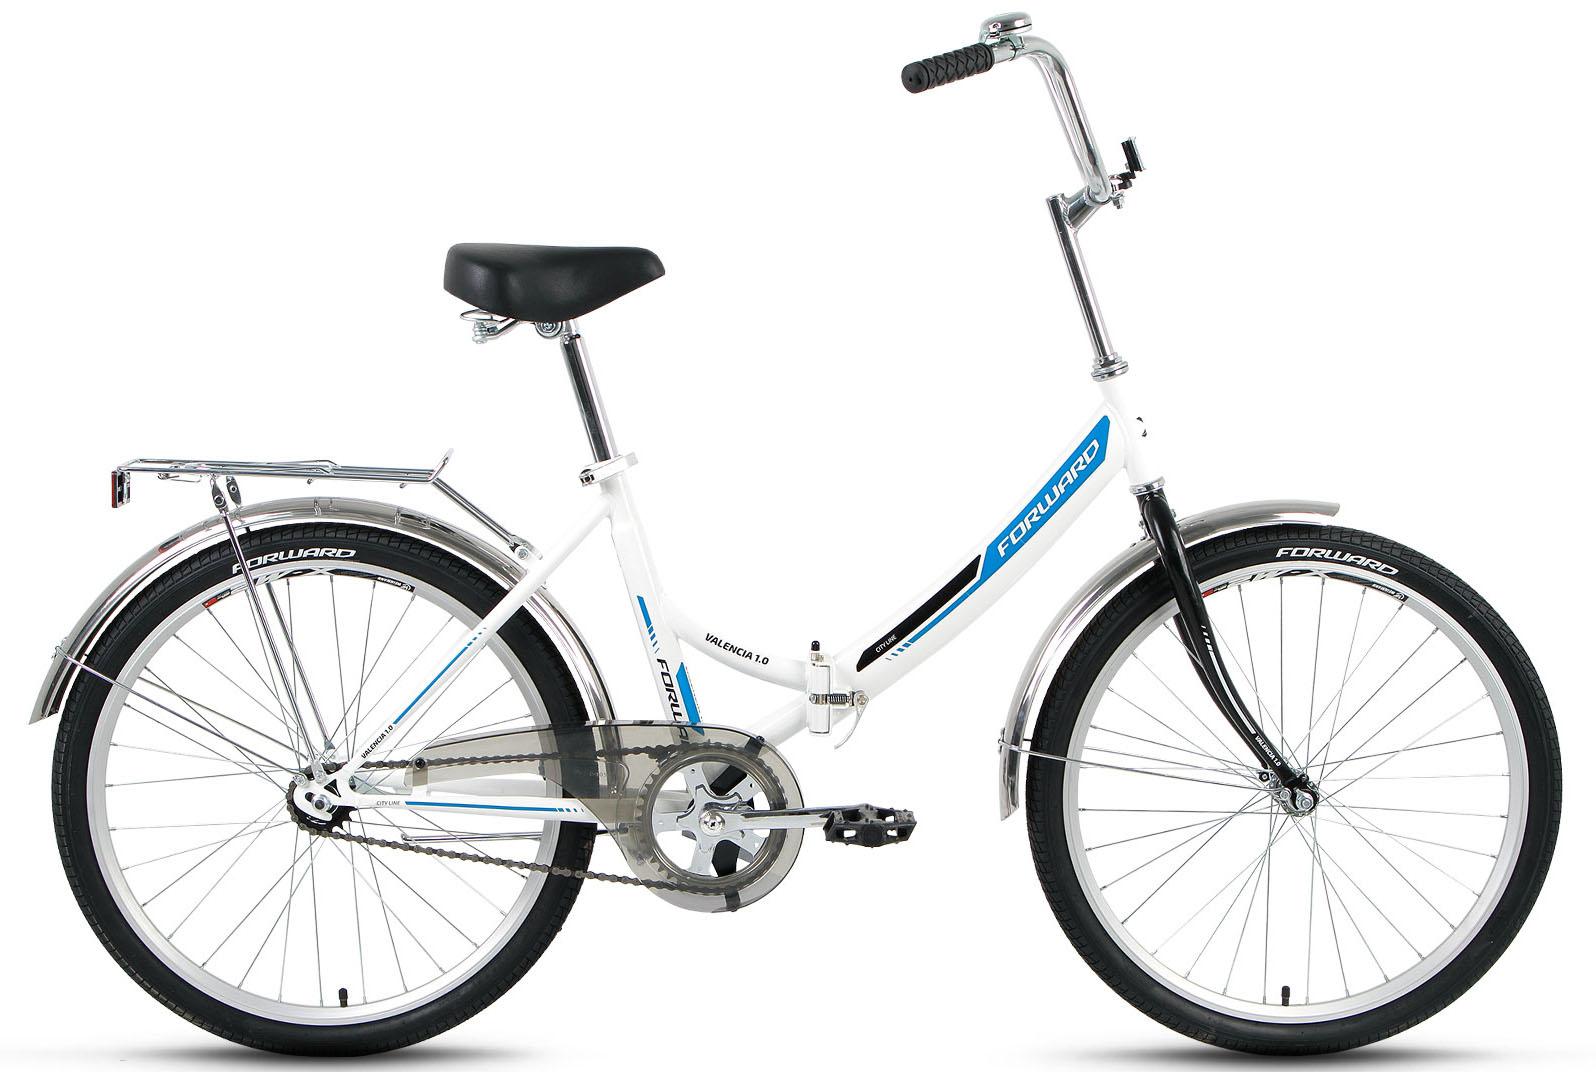 Велосипед Forward Valencia 24 1.0 2019 велосипед forward rivera 1 0 2018